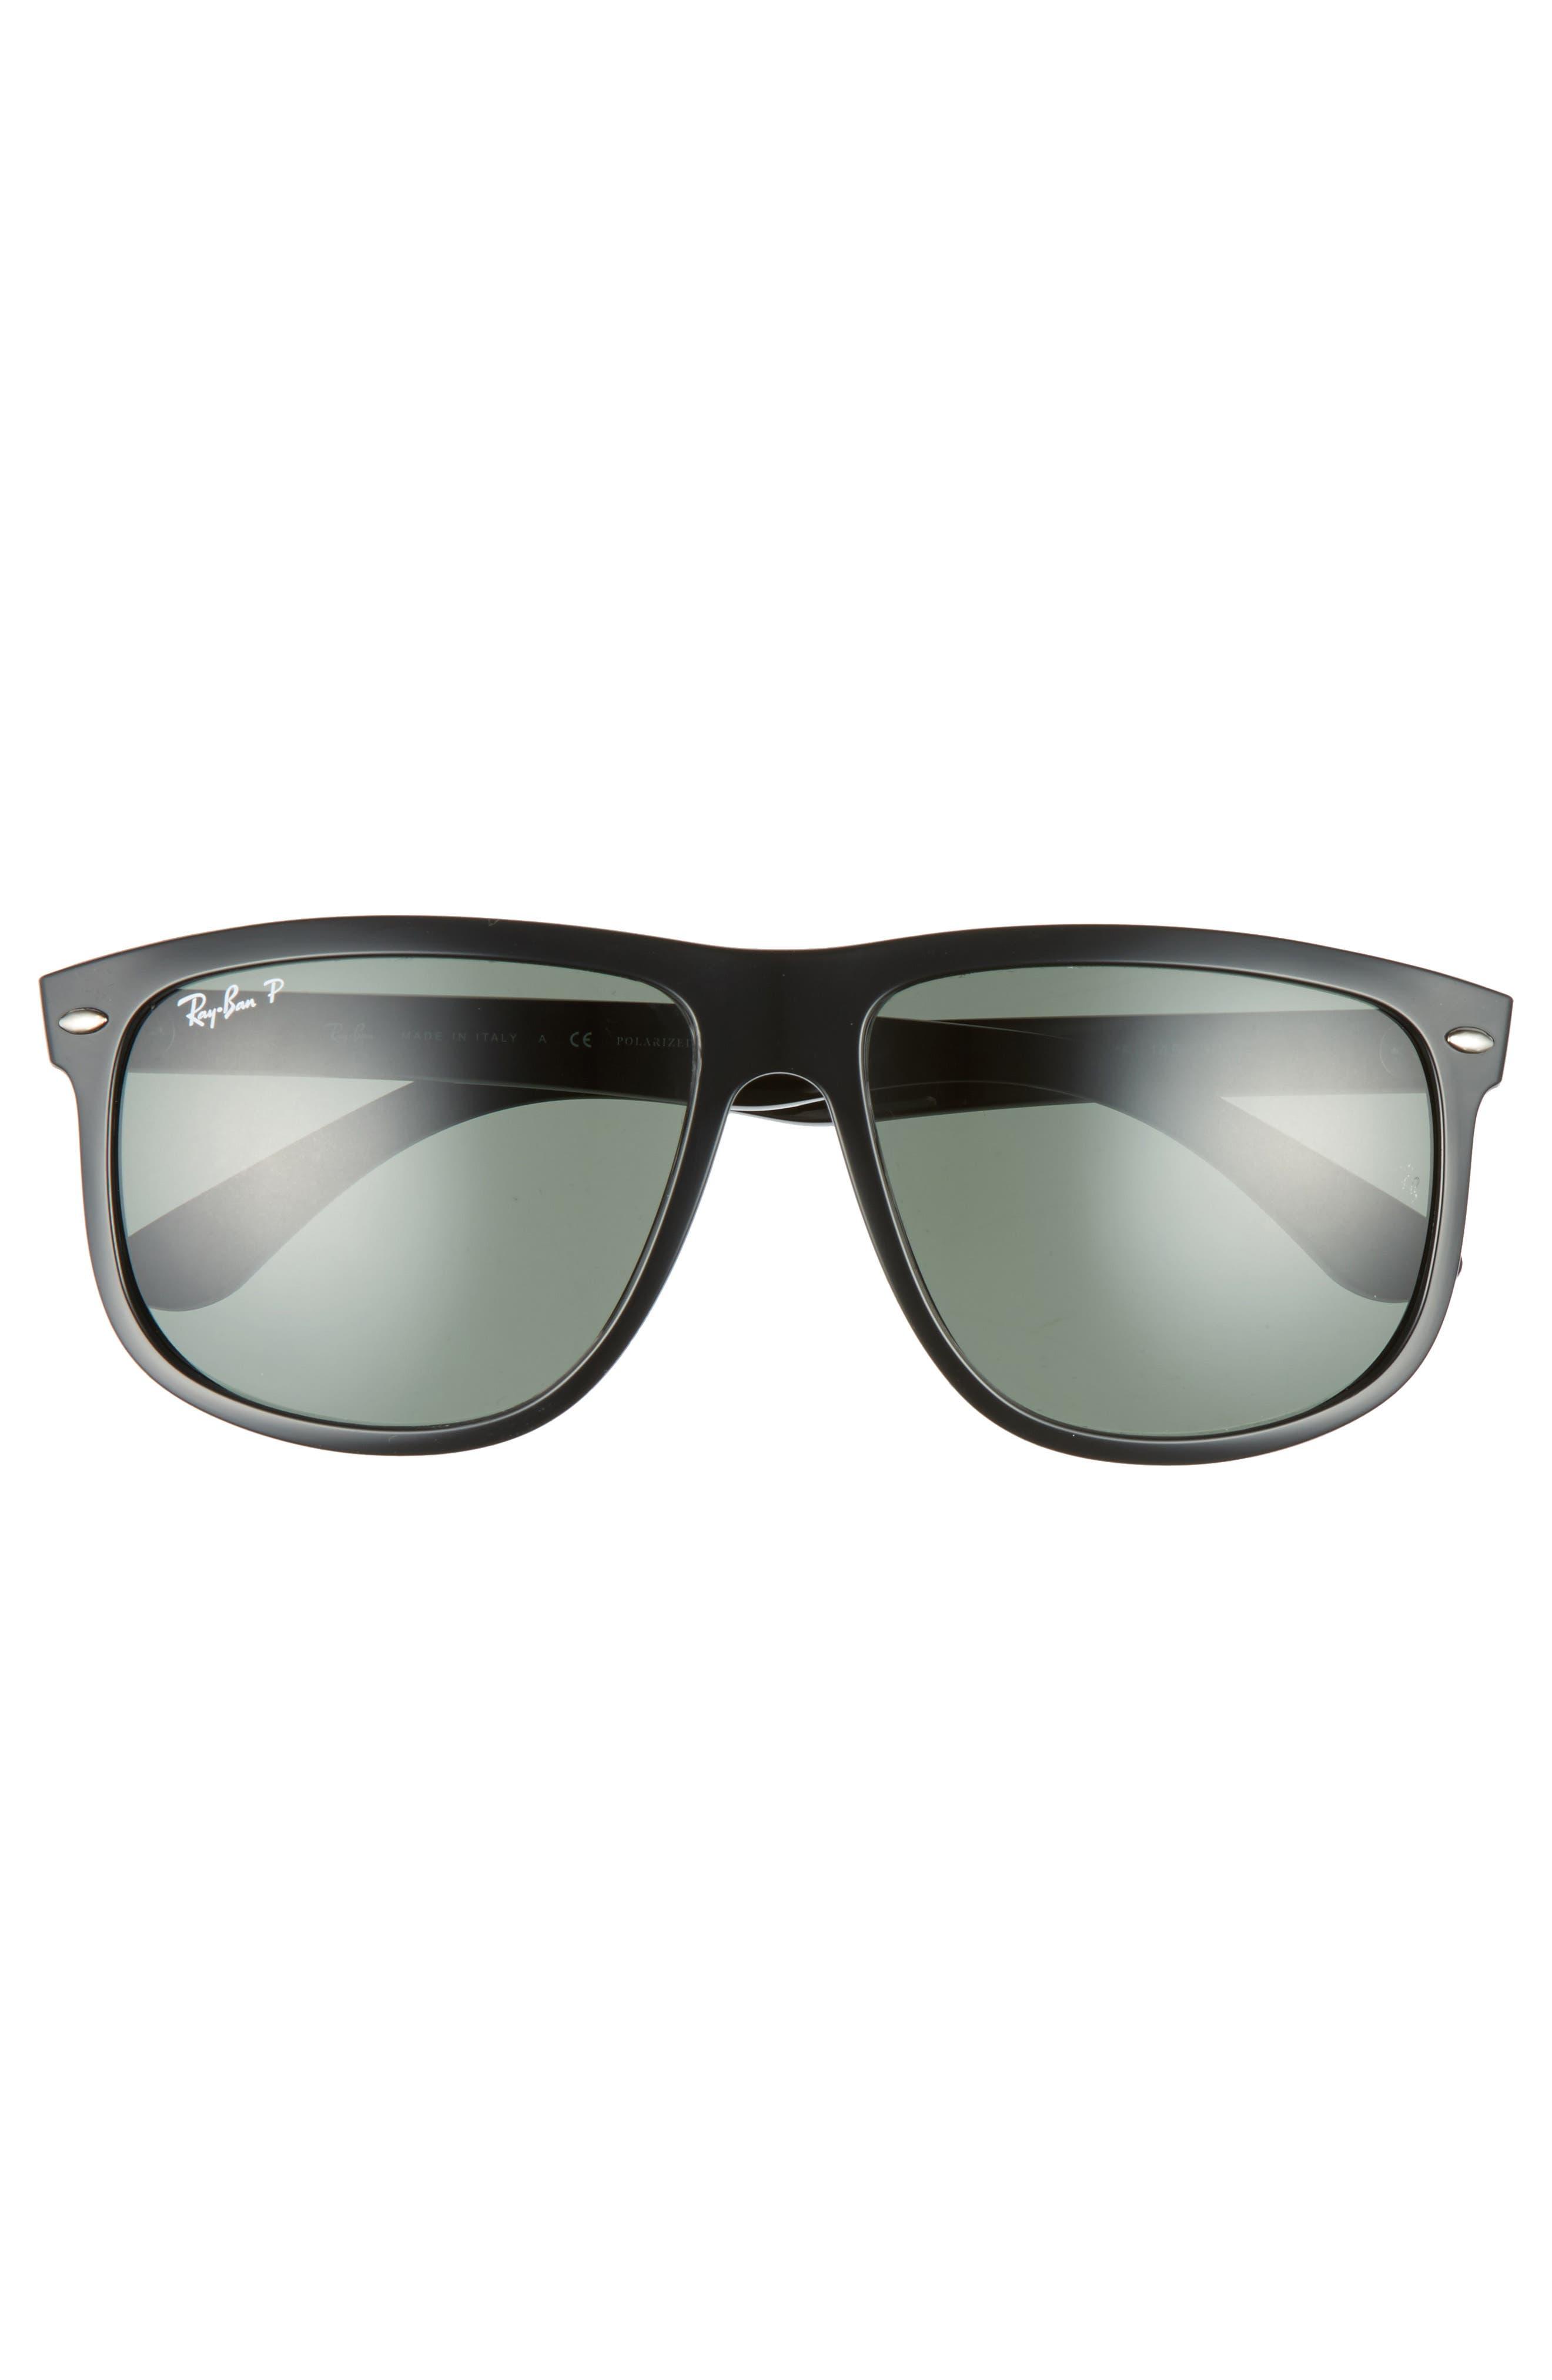 Highstreet 60mm Polarized Flat Top Sunglasses,                             Alternate thumbnail 4, color,                             BLACK POLARIZED